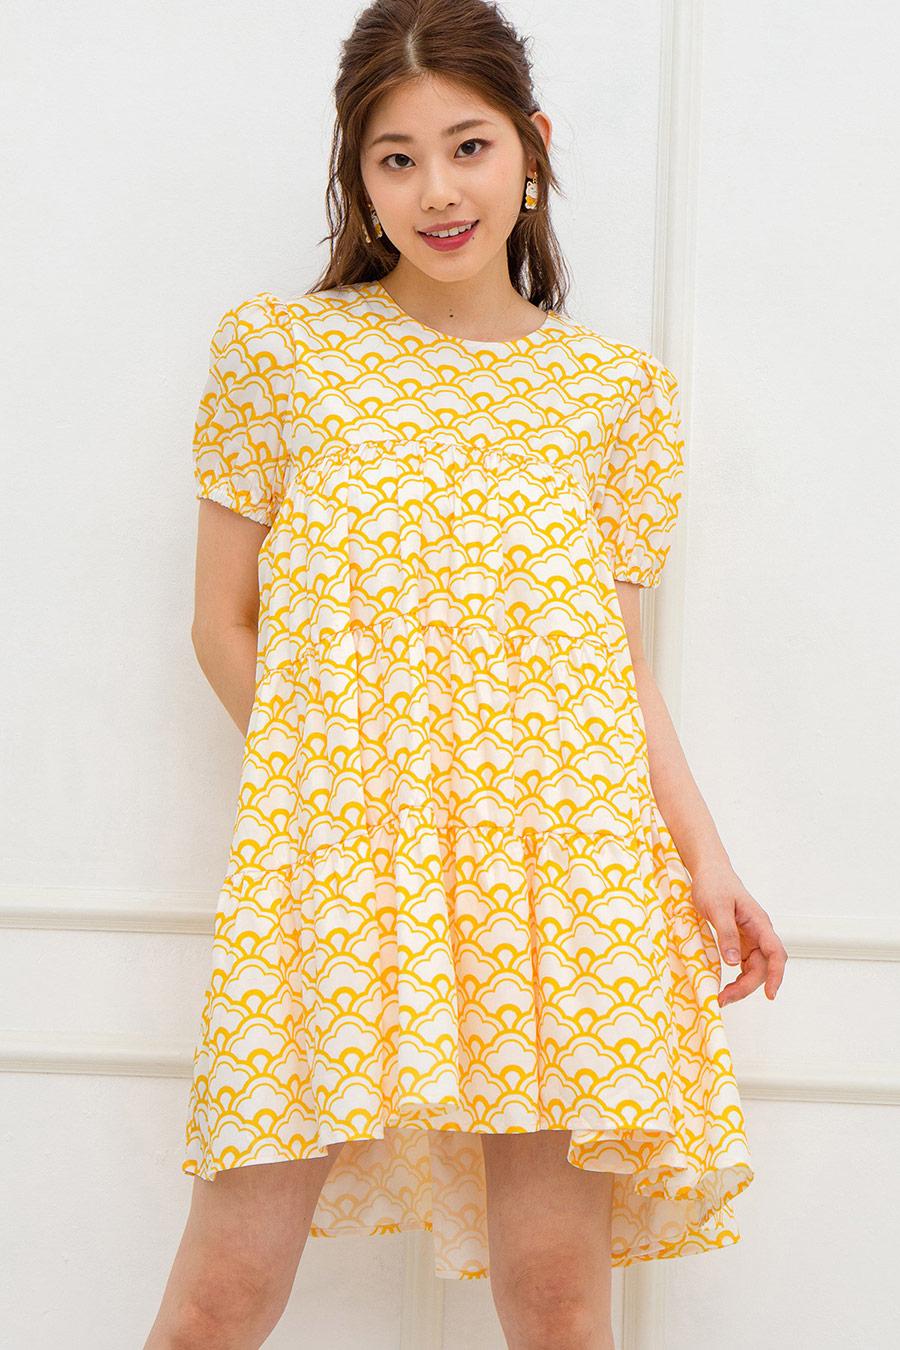 REGINA DRESS - KAIGARA [BY MODPARADE]